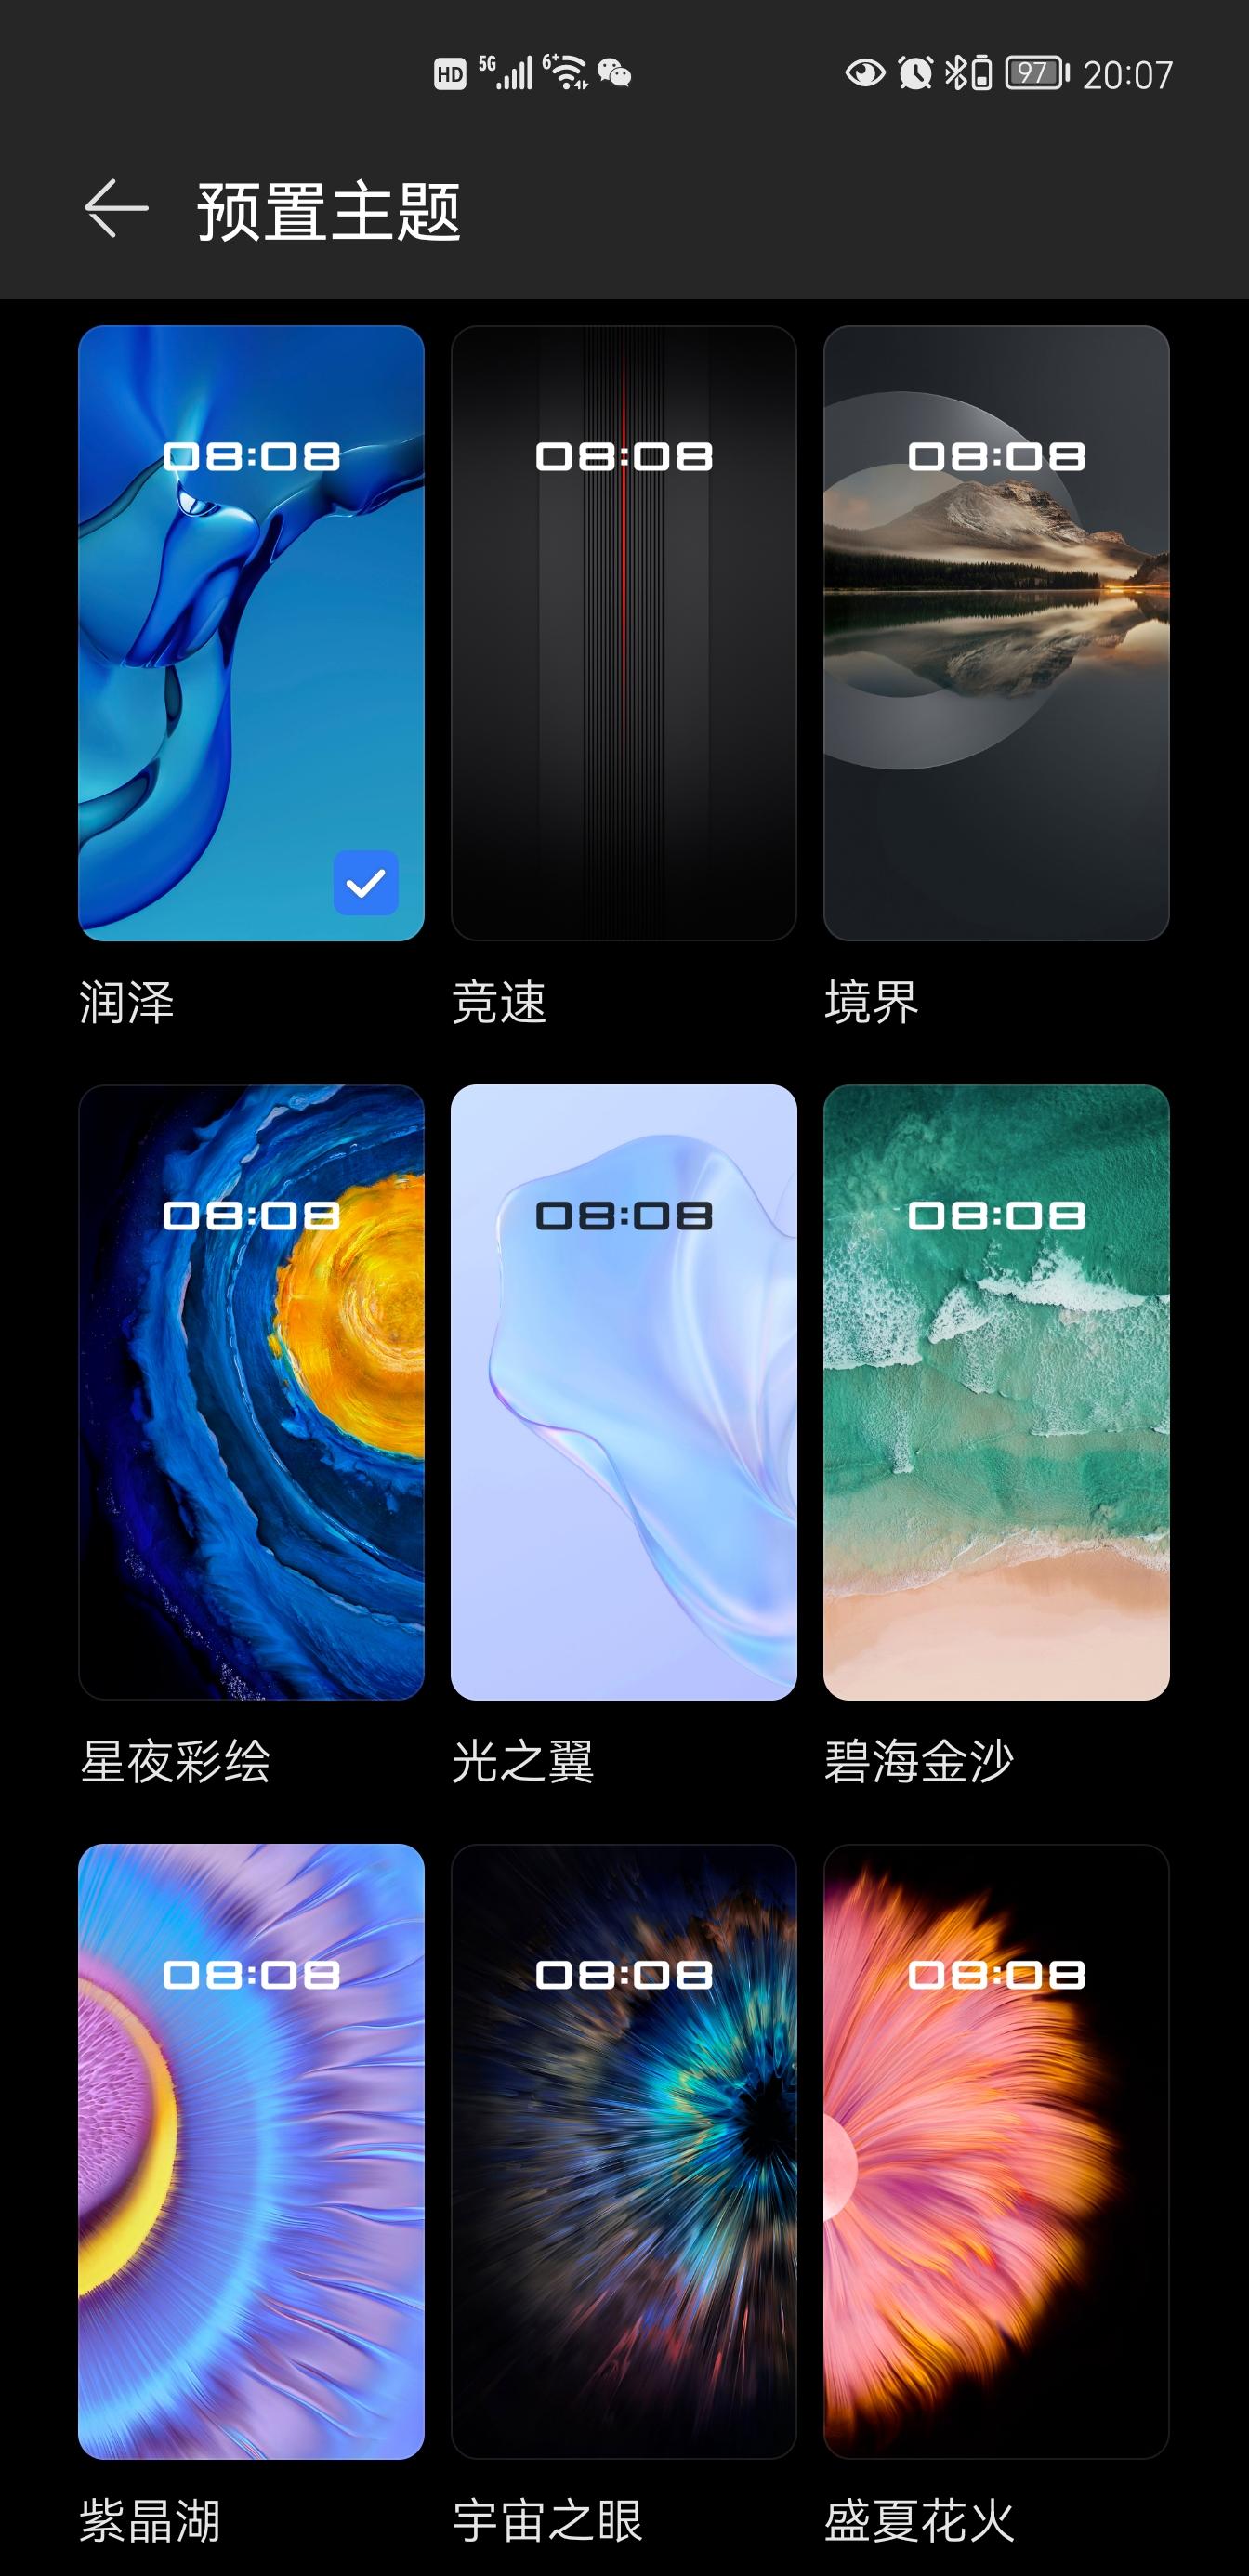 Screenshot_20210609_200723_com.huawei.android.thememanager.jpg